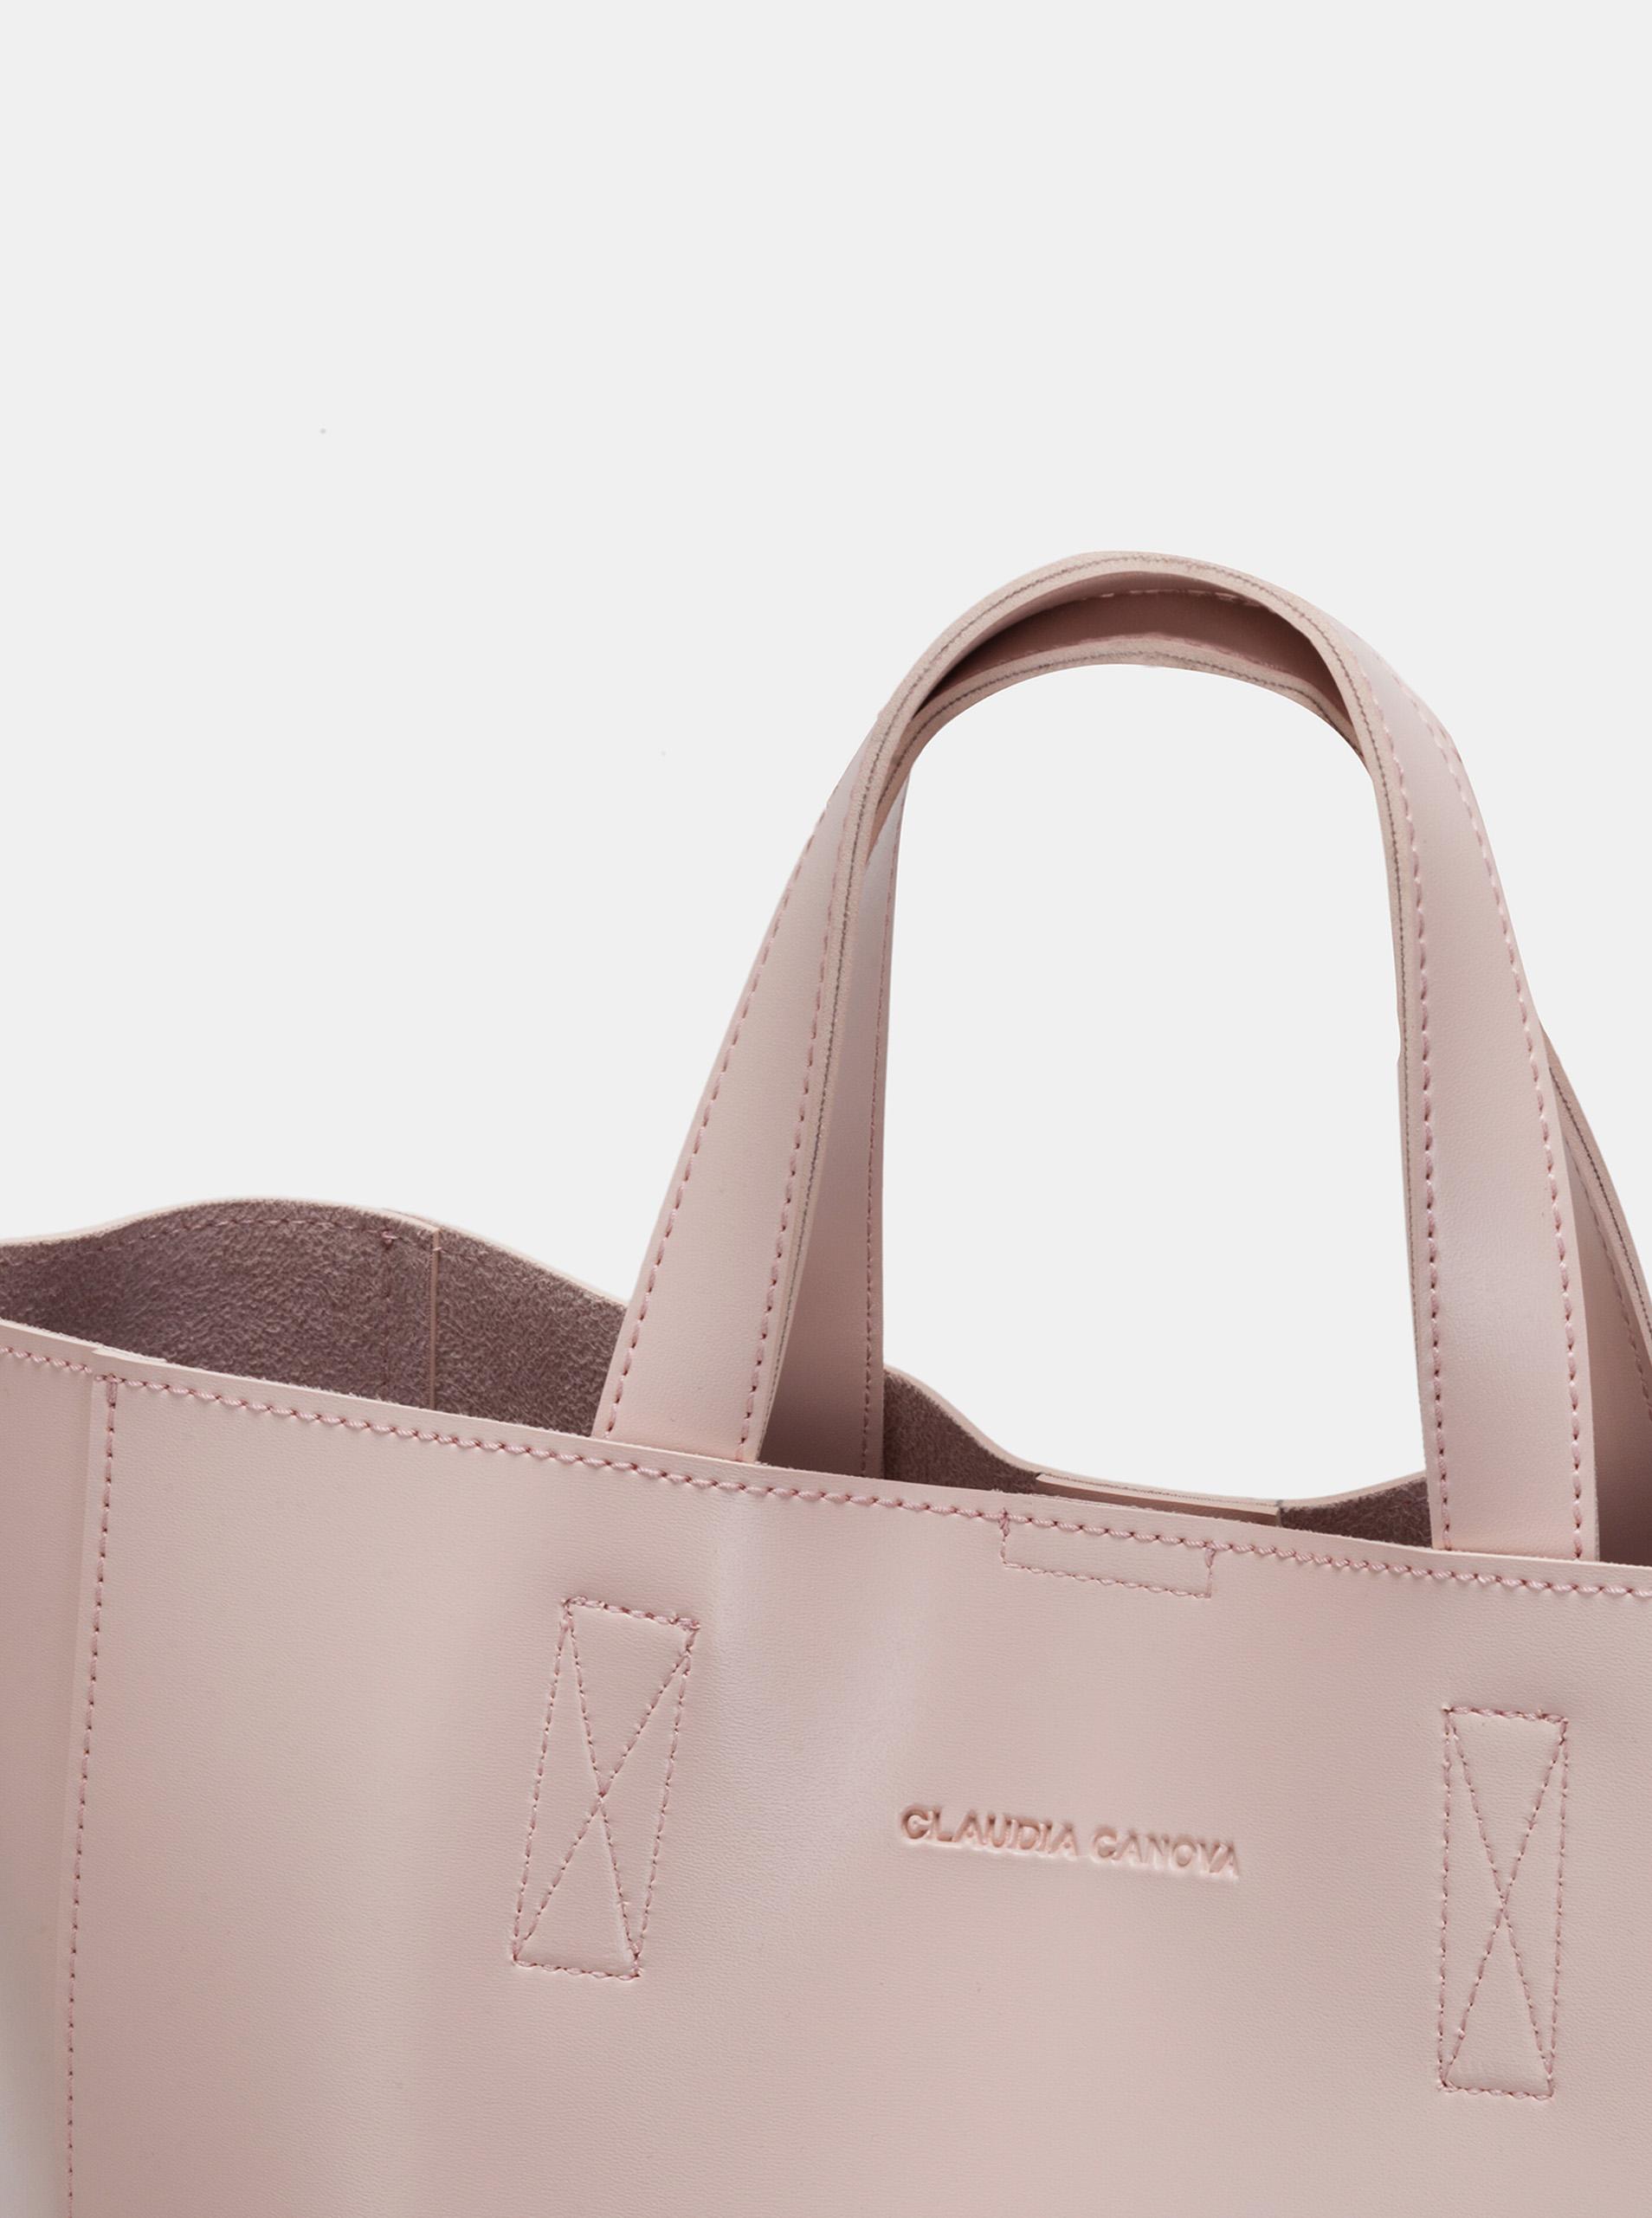 Claudia Canova rosa grande borsetta